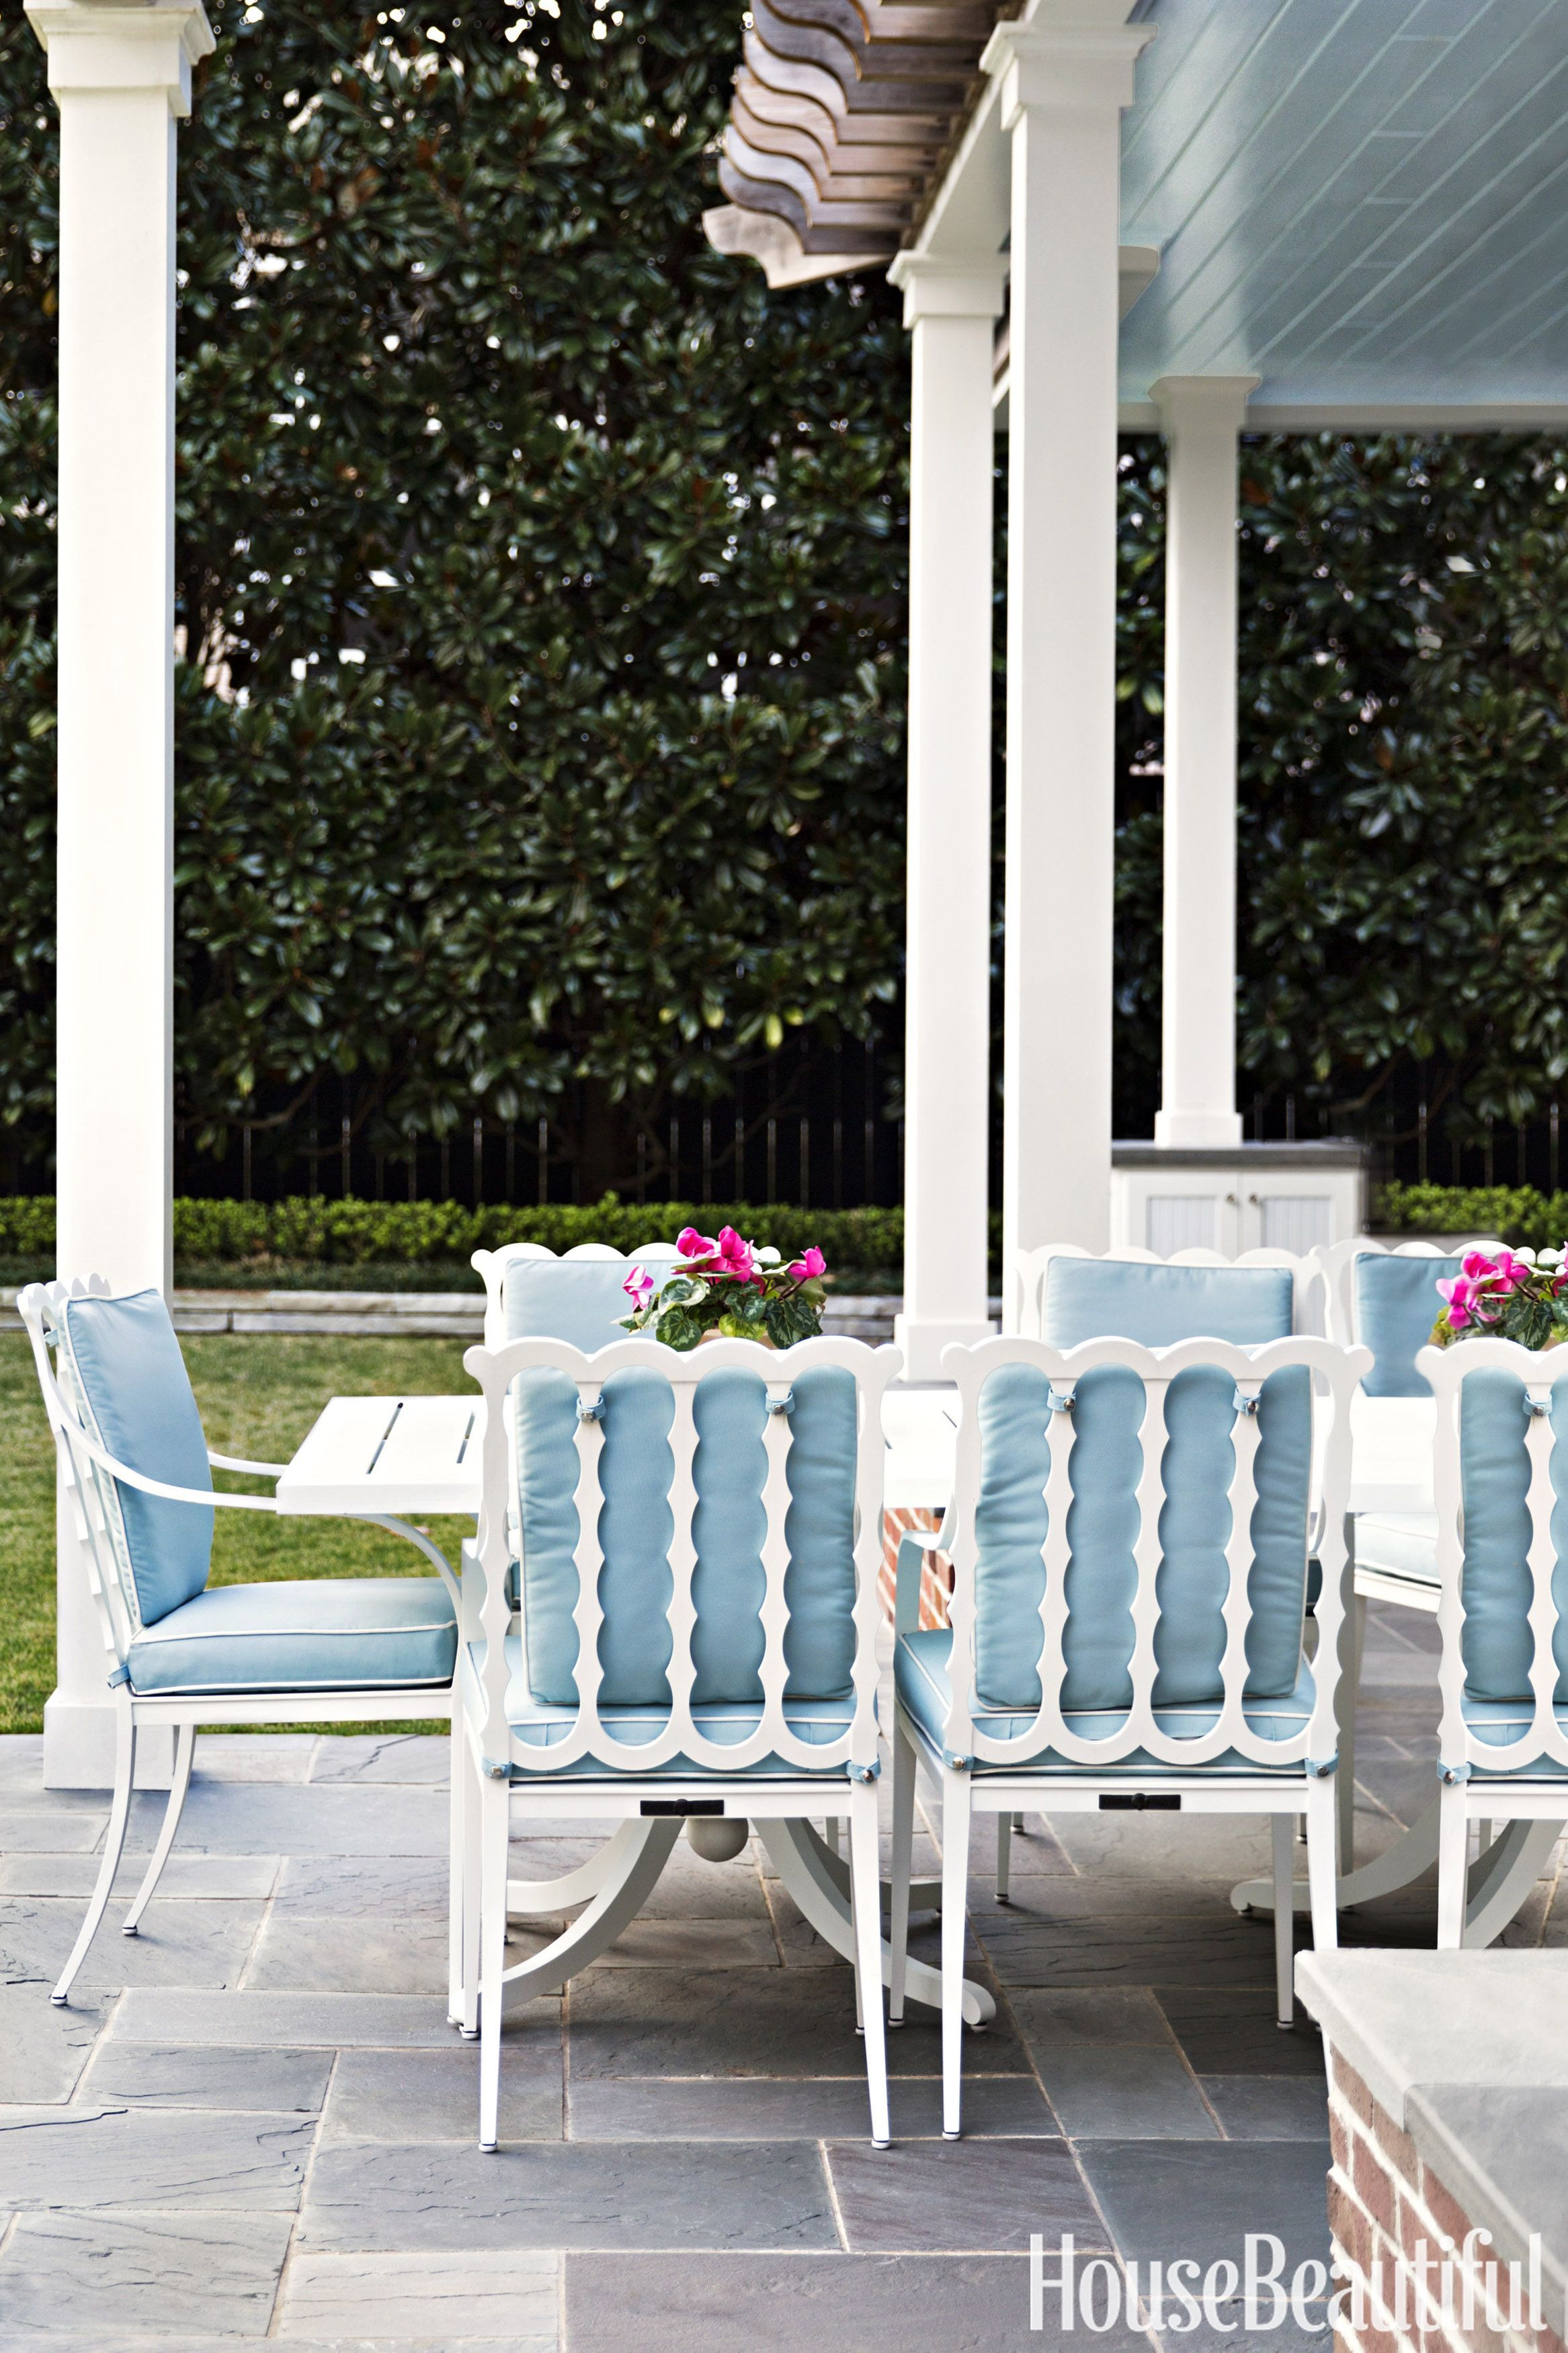 21 Glamorous Patio Design Australia That Will Inspire Patio Design Outdoor Rooms Outdoor Spaces